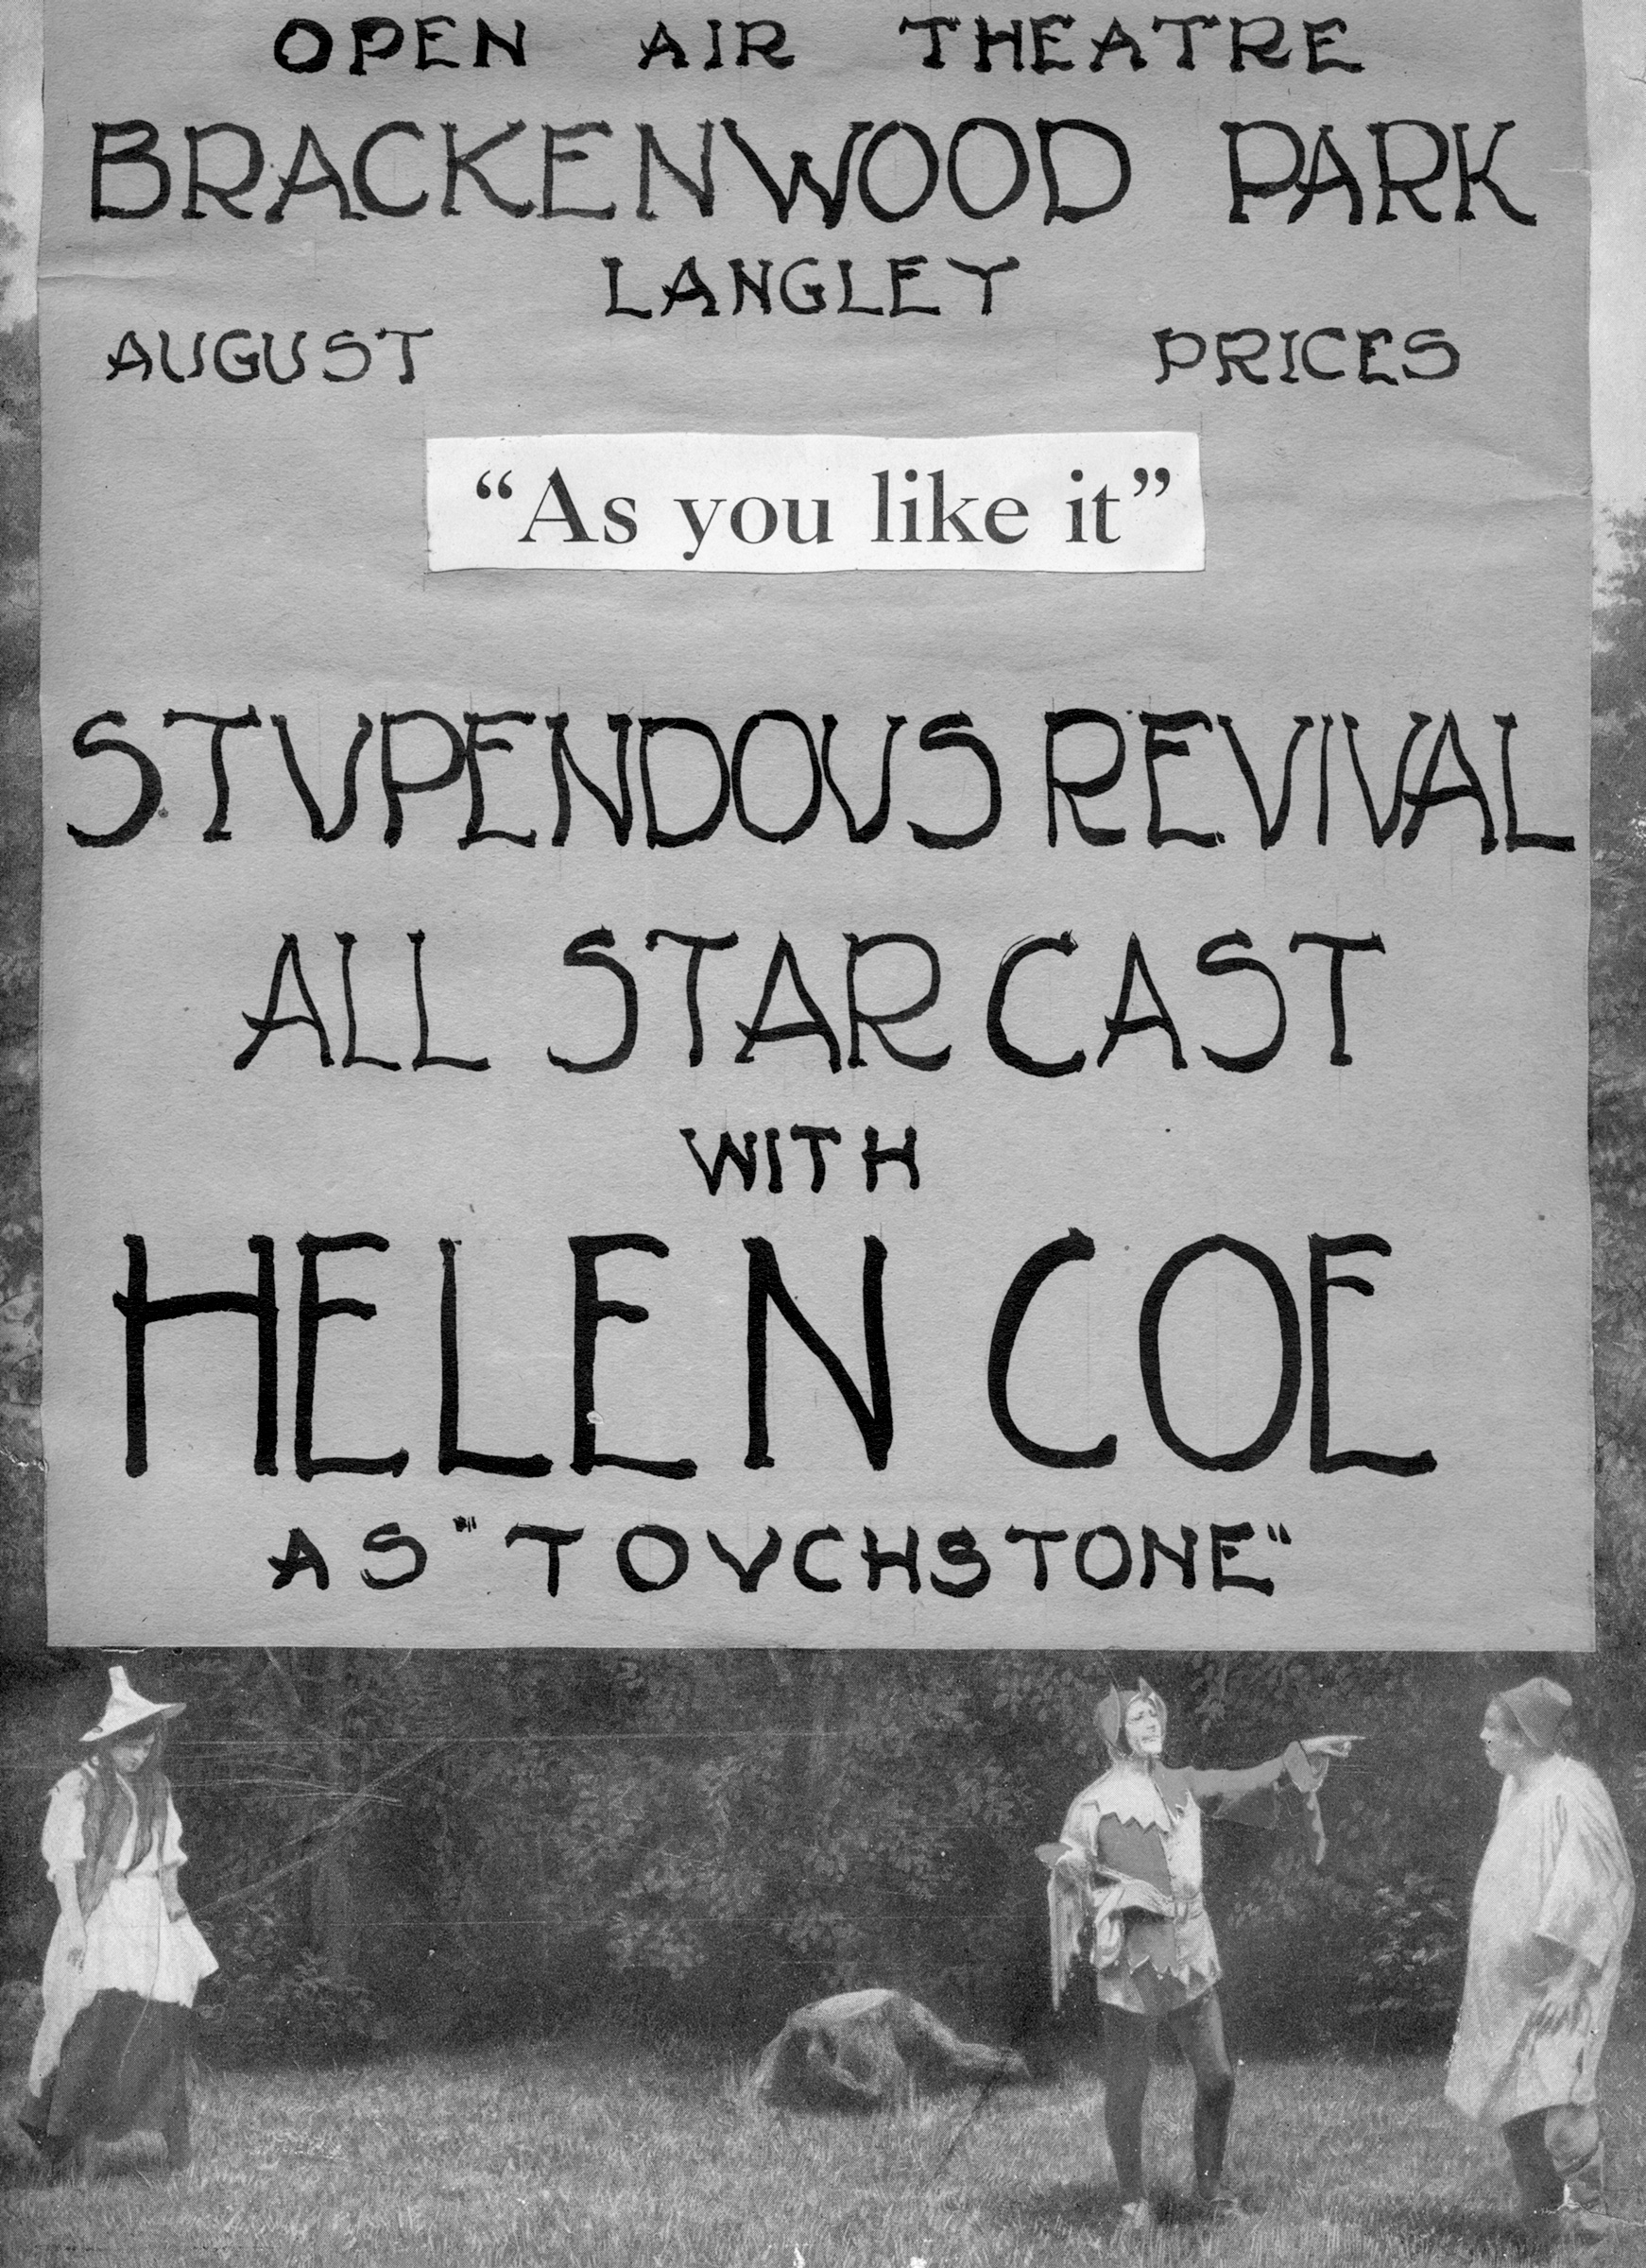 Same play, 100 years earlier